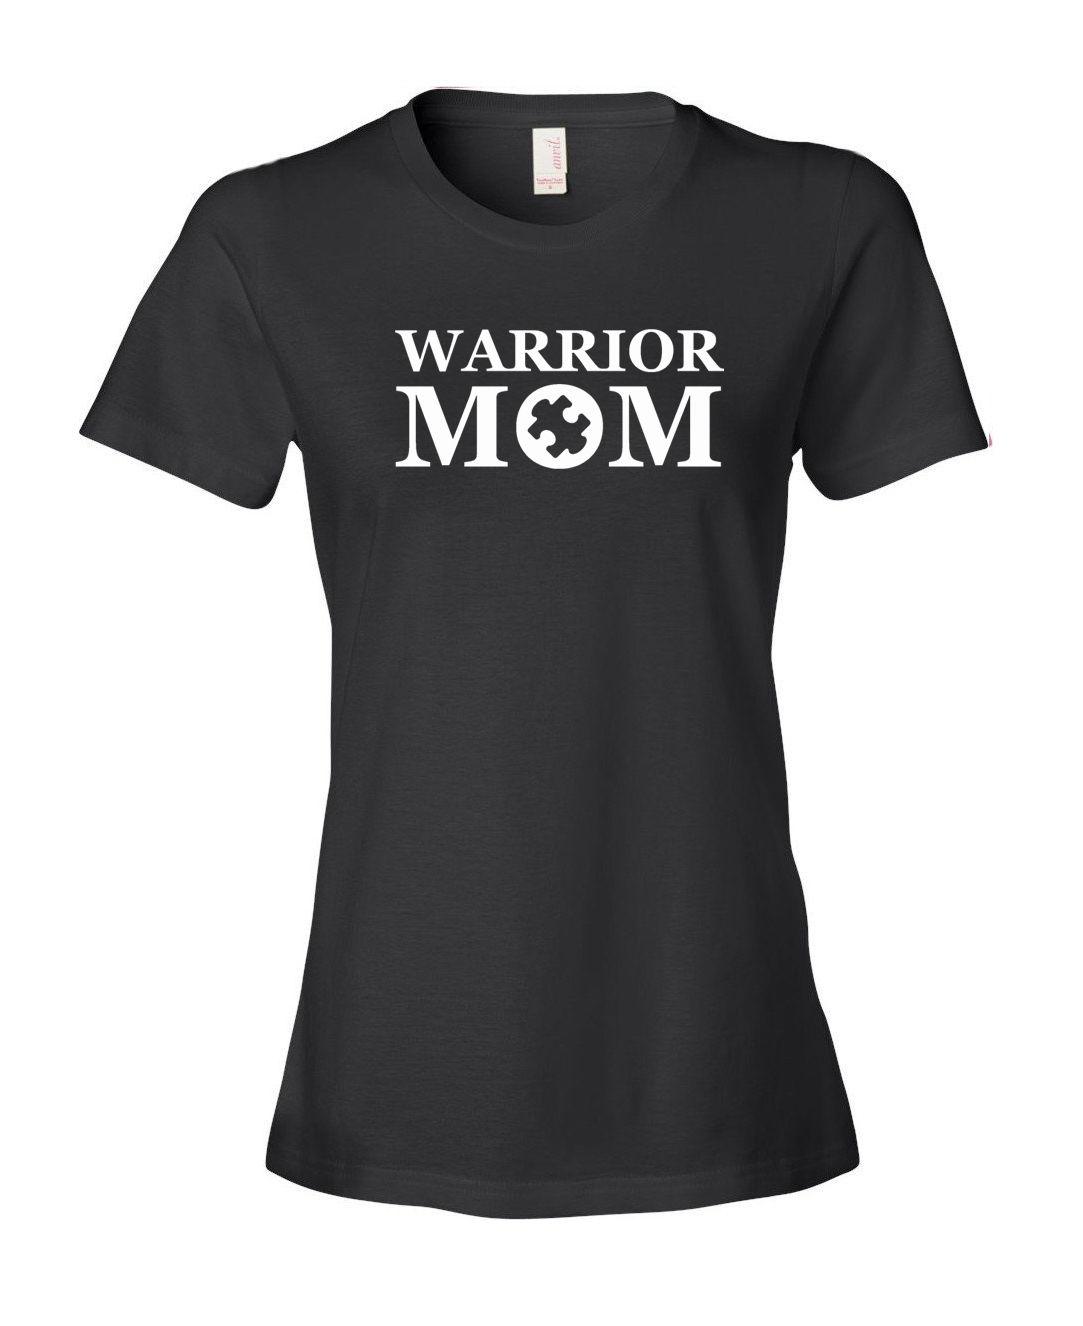 Fashion Summer Paried T Shirts Short Printing Warrior Mom Autism O-Neck Womens Shirt